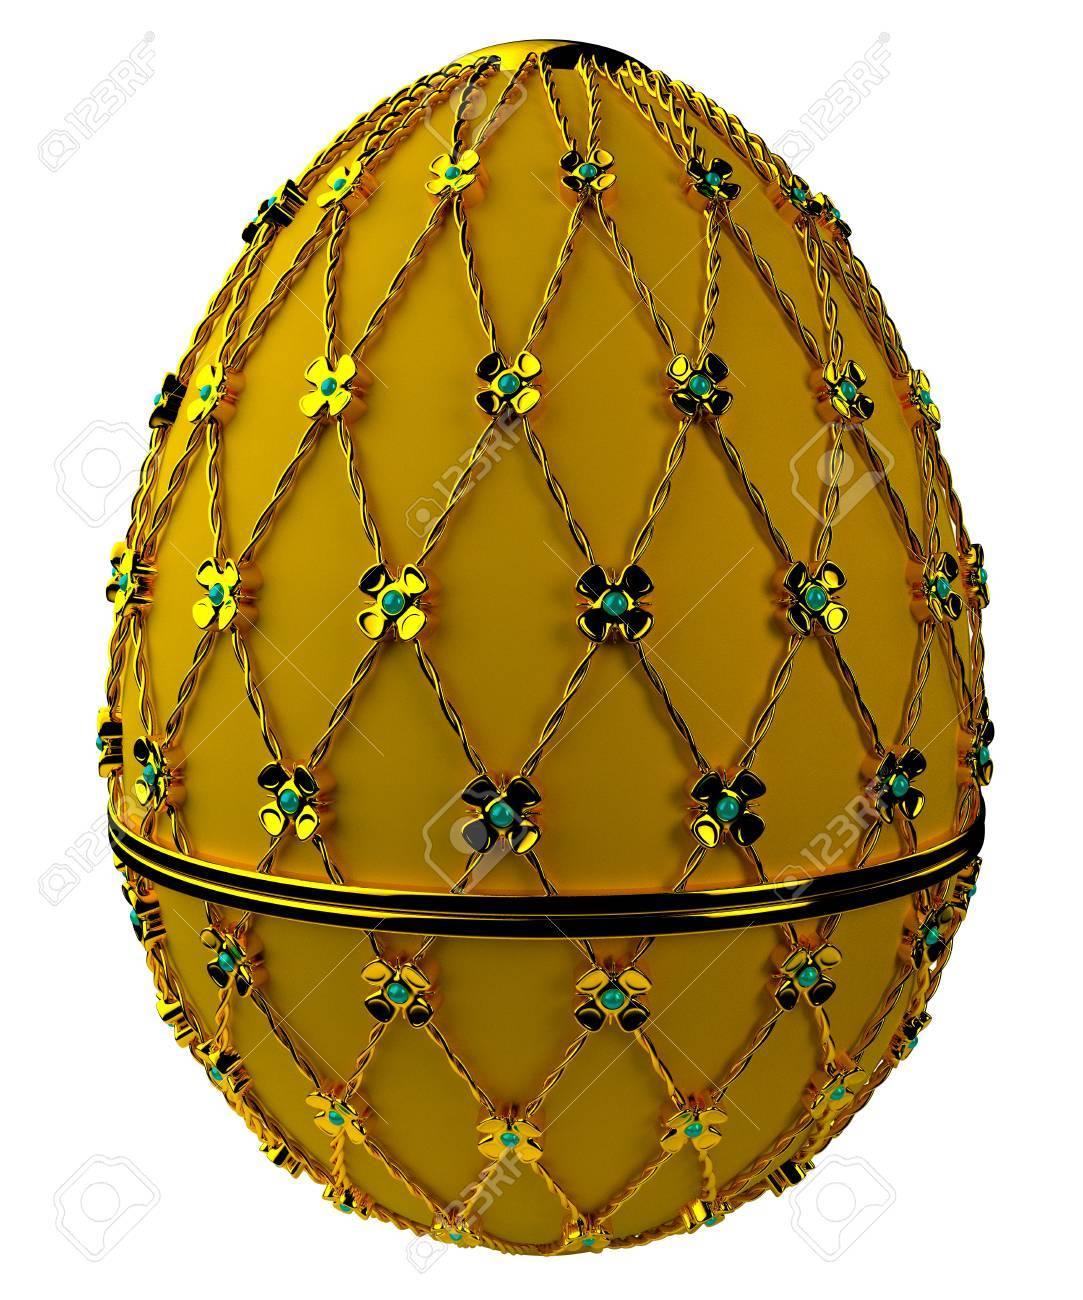 Jewelry egg. 3D render. Stock Photo - 75860166